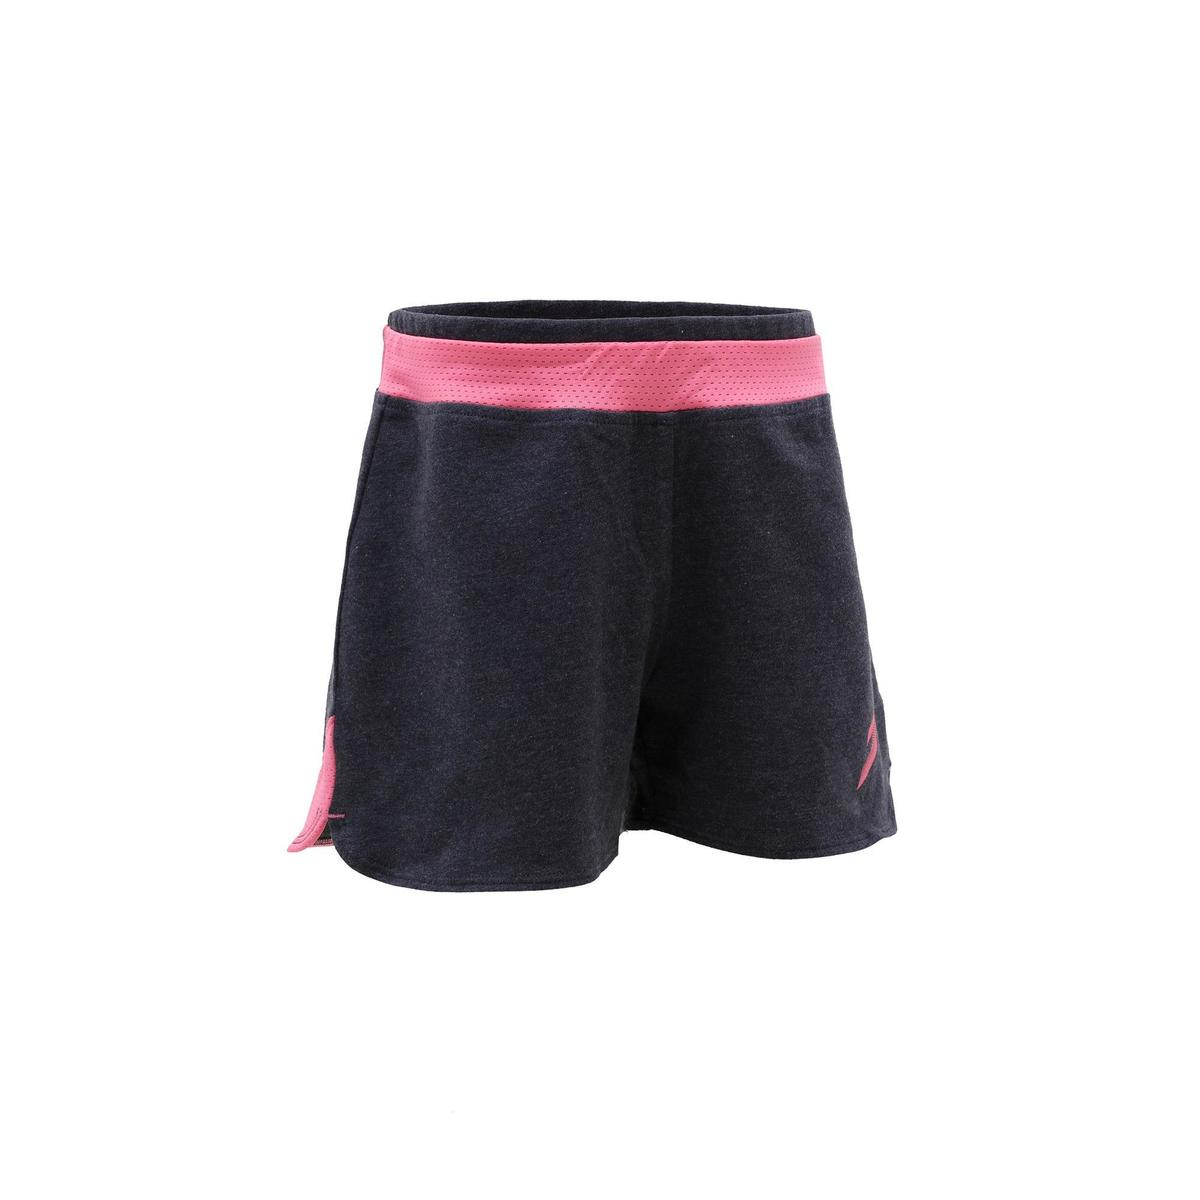 Bild 1 von Sporthose kurz 500 Gym Kinder grau/rosa mit Print